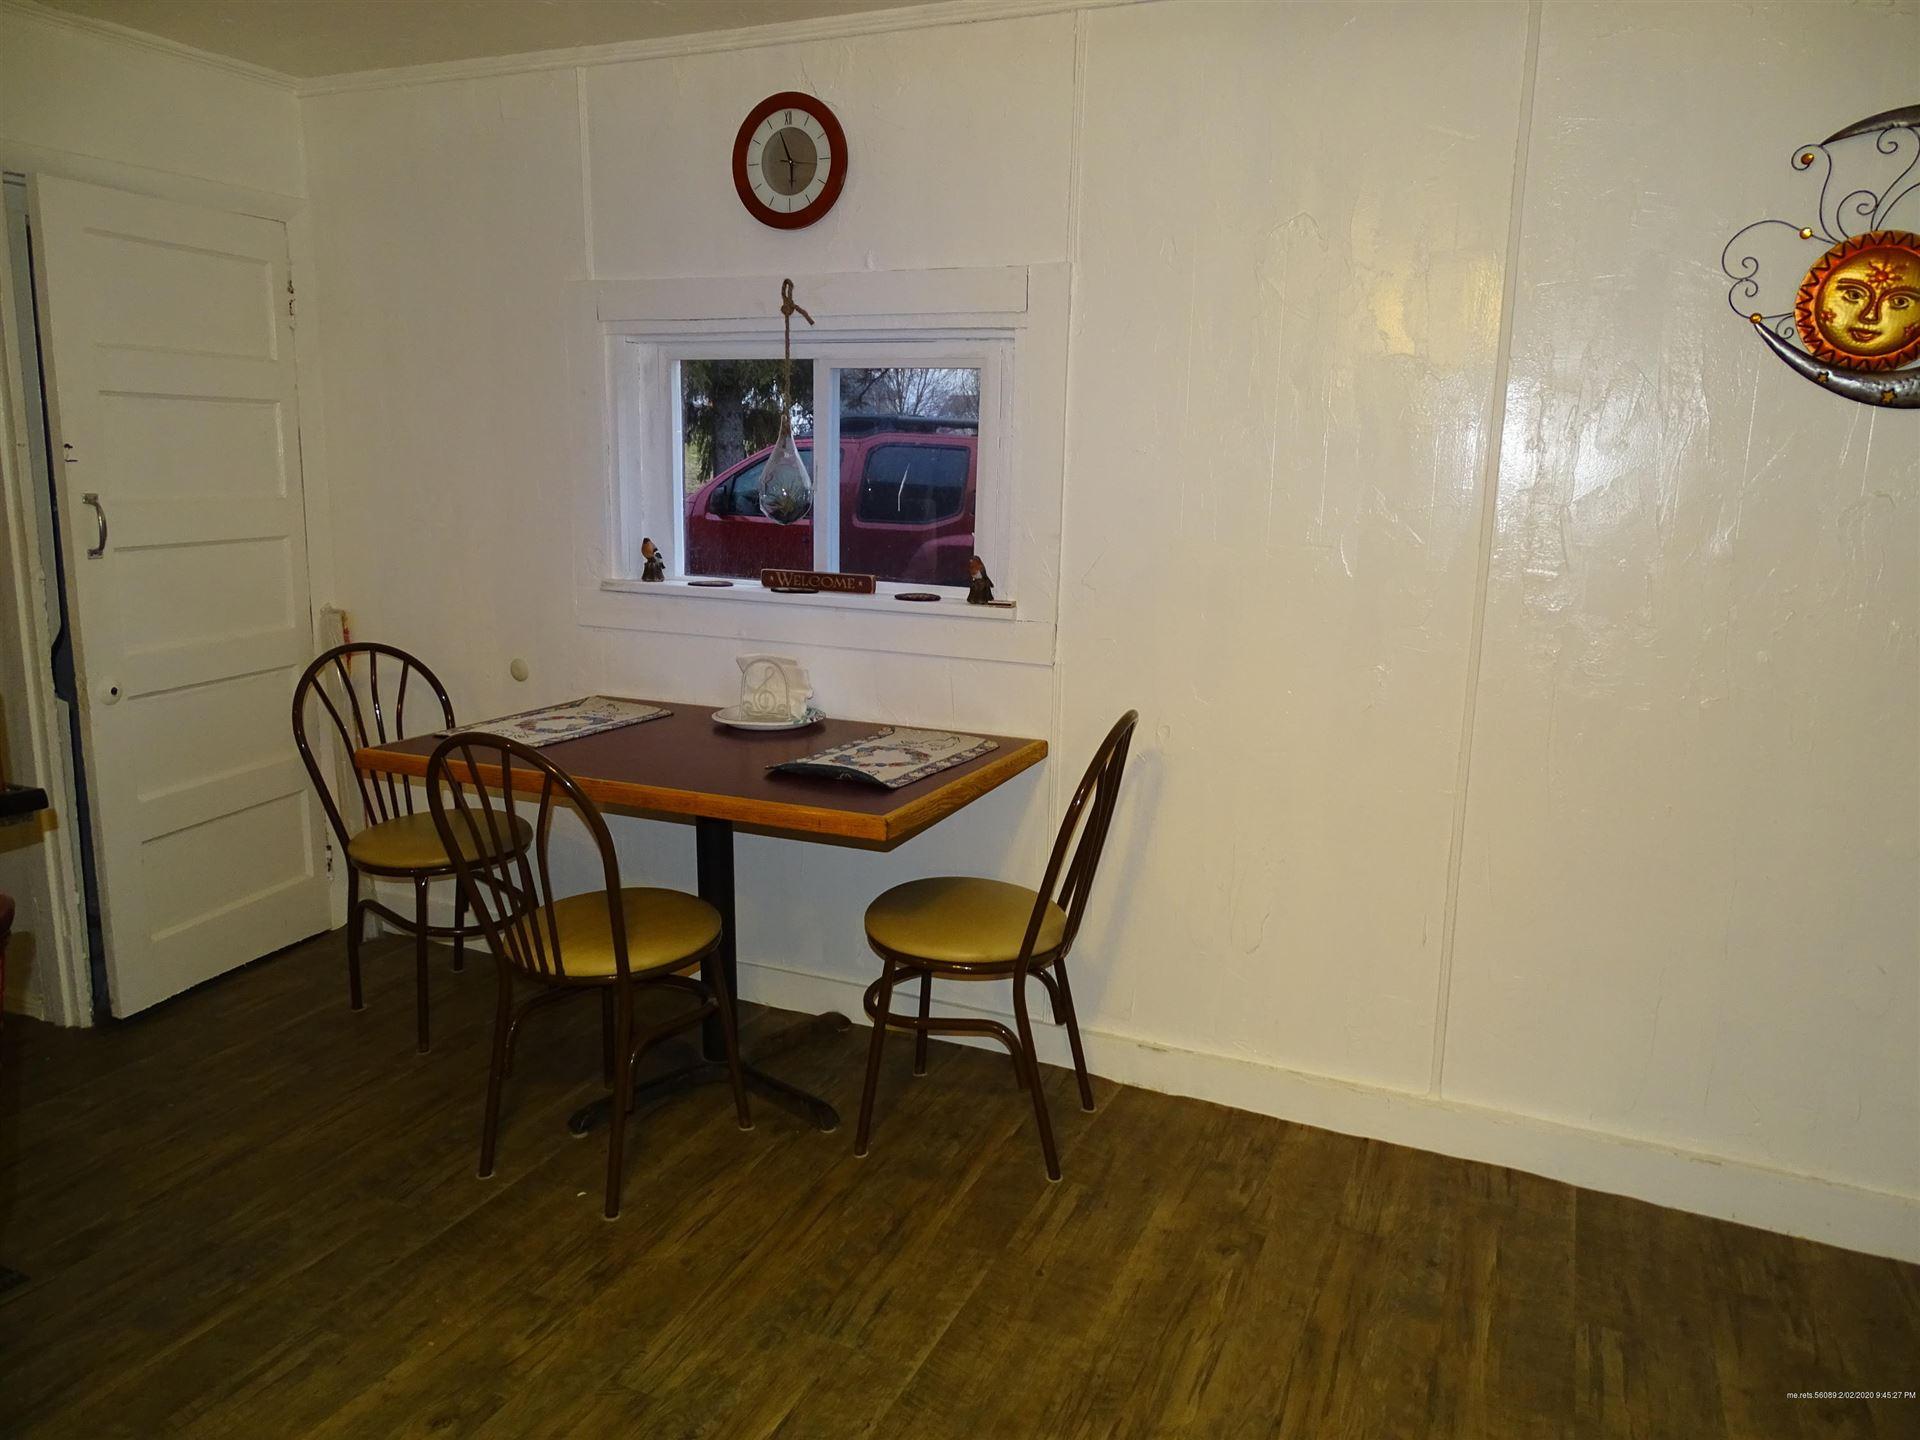 Photo of 19 Decker Street, Fort Fairfield, ME 04742 (MLS # 1410777)